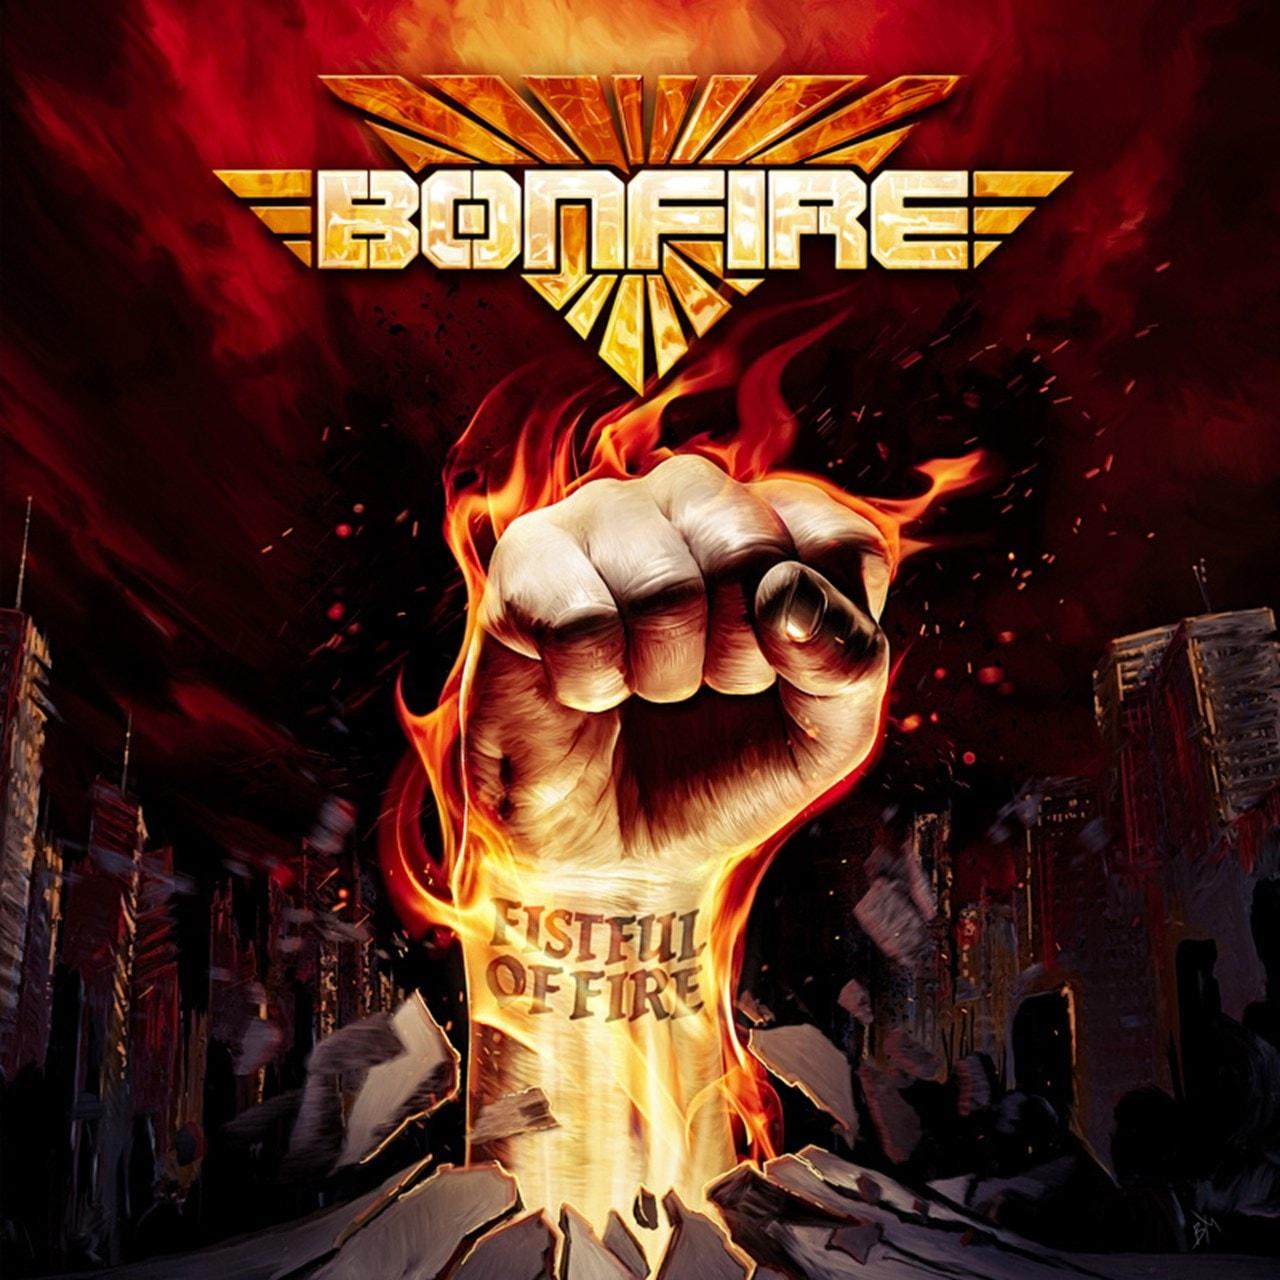 Fistful of Fire - 1